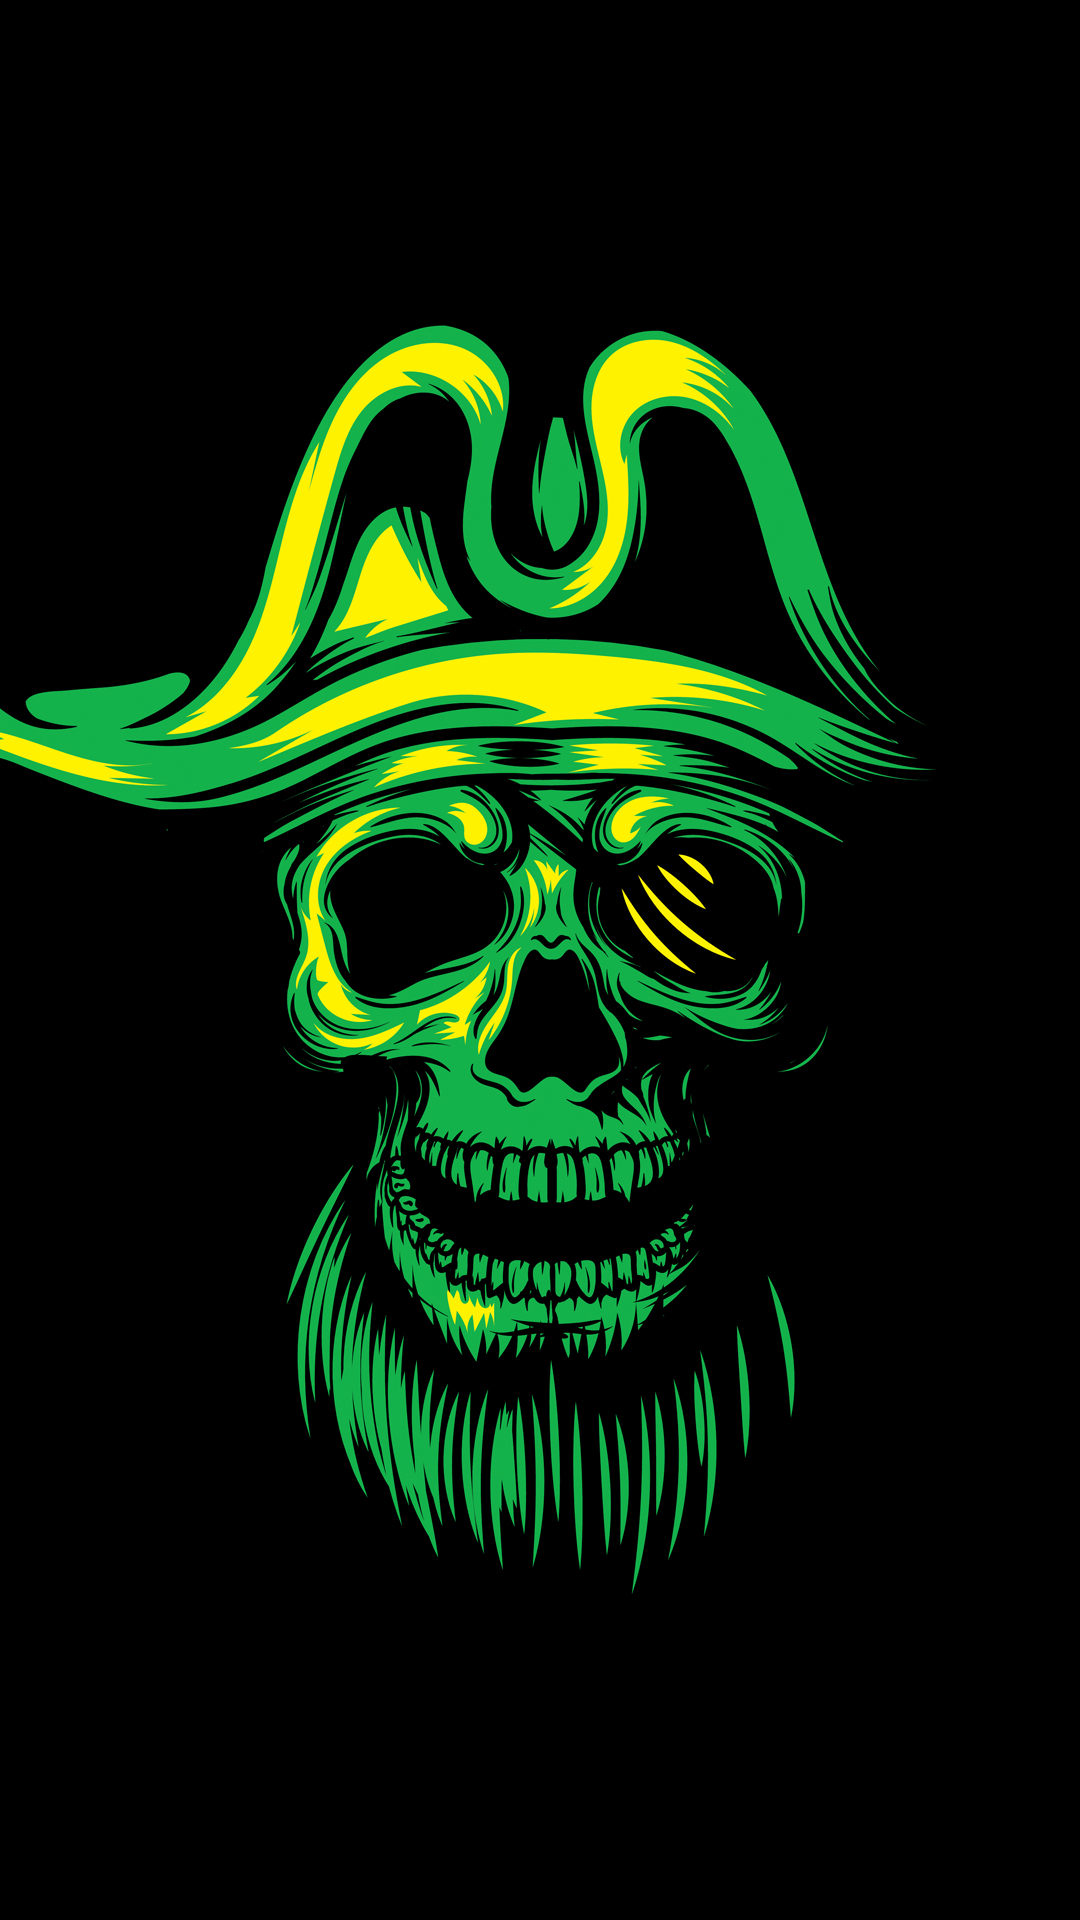 pirate-skull-1142